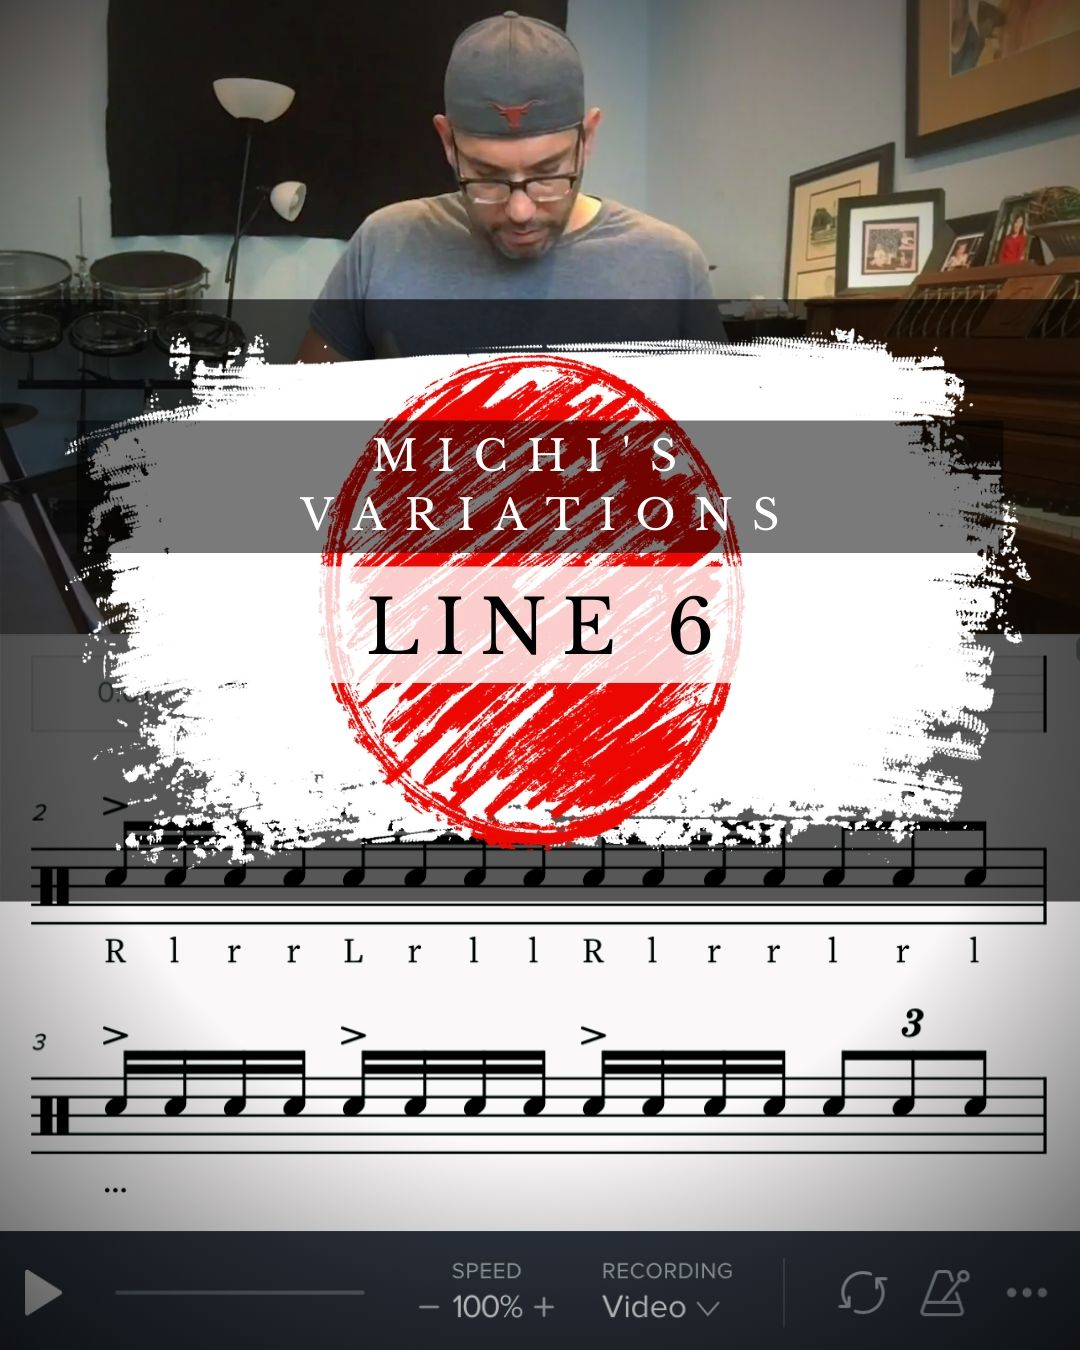 Michi's Variations Line 6